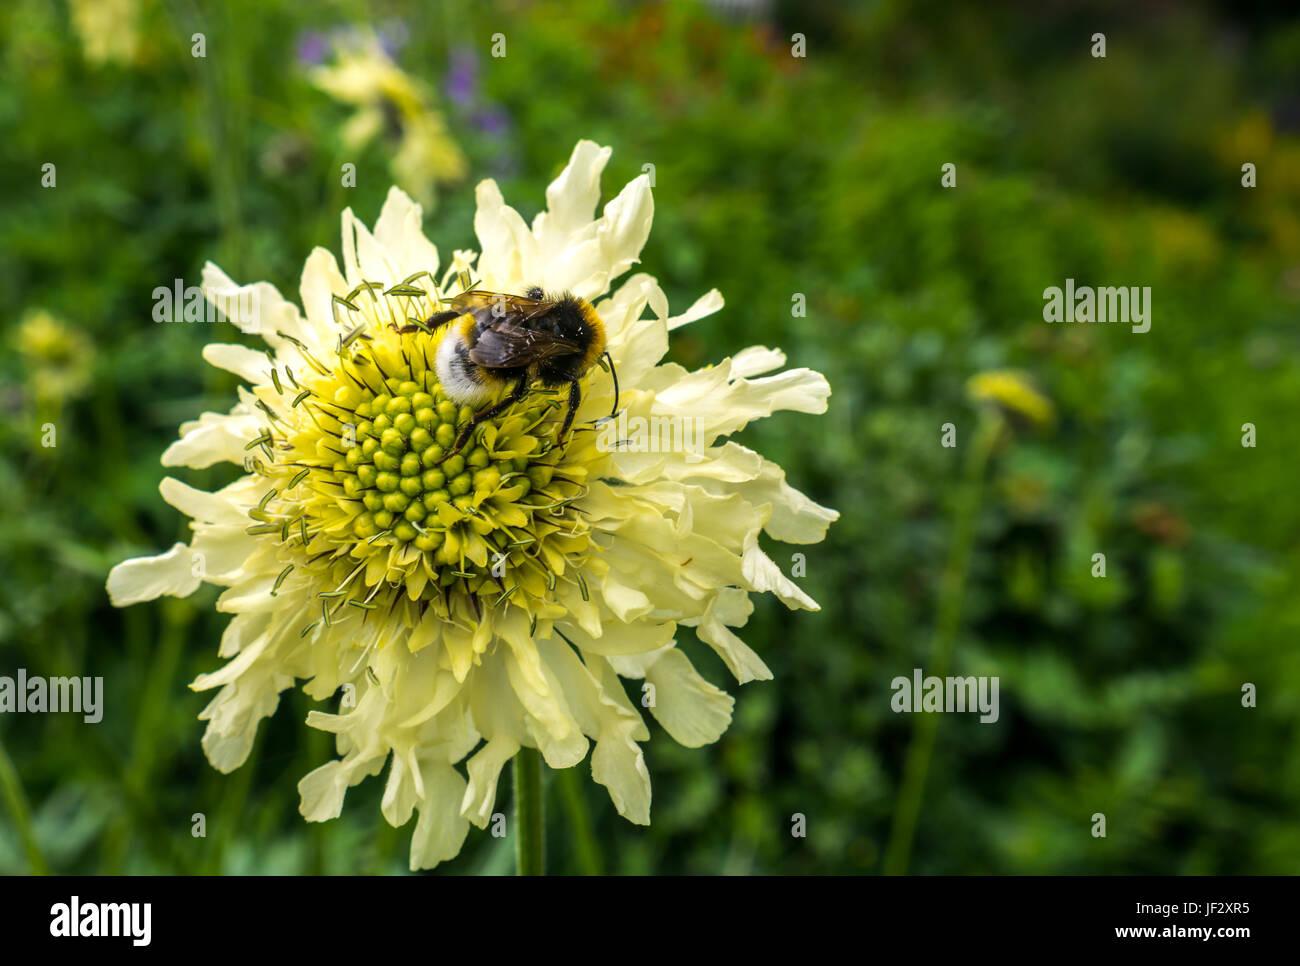 Giant scabious, Cephalaria gigantea, flower with bee, Bombus sylvestris, with blurred background, Dirleton Castle - Stock Image